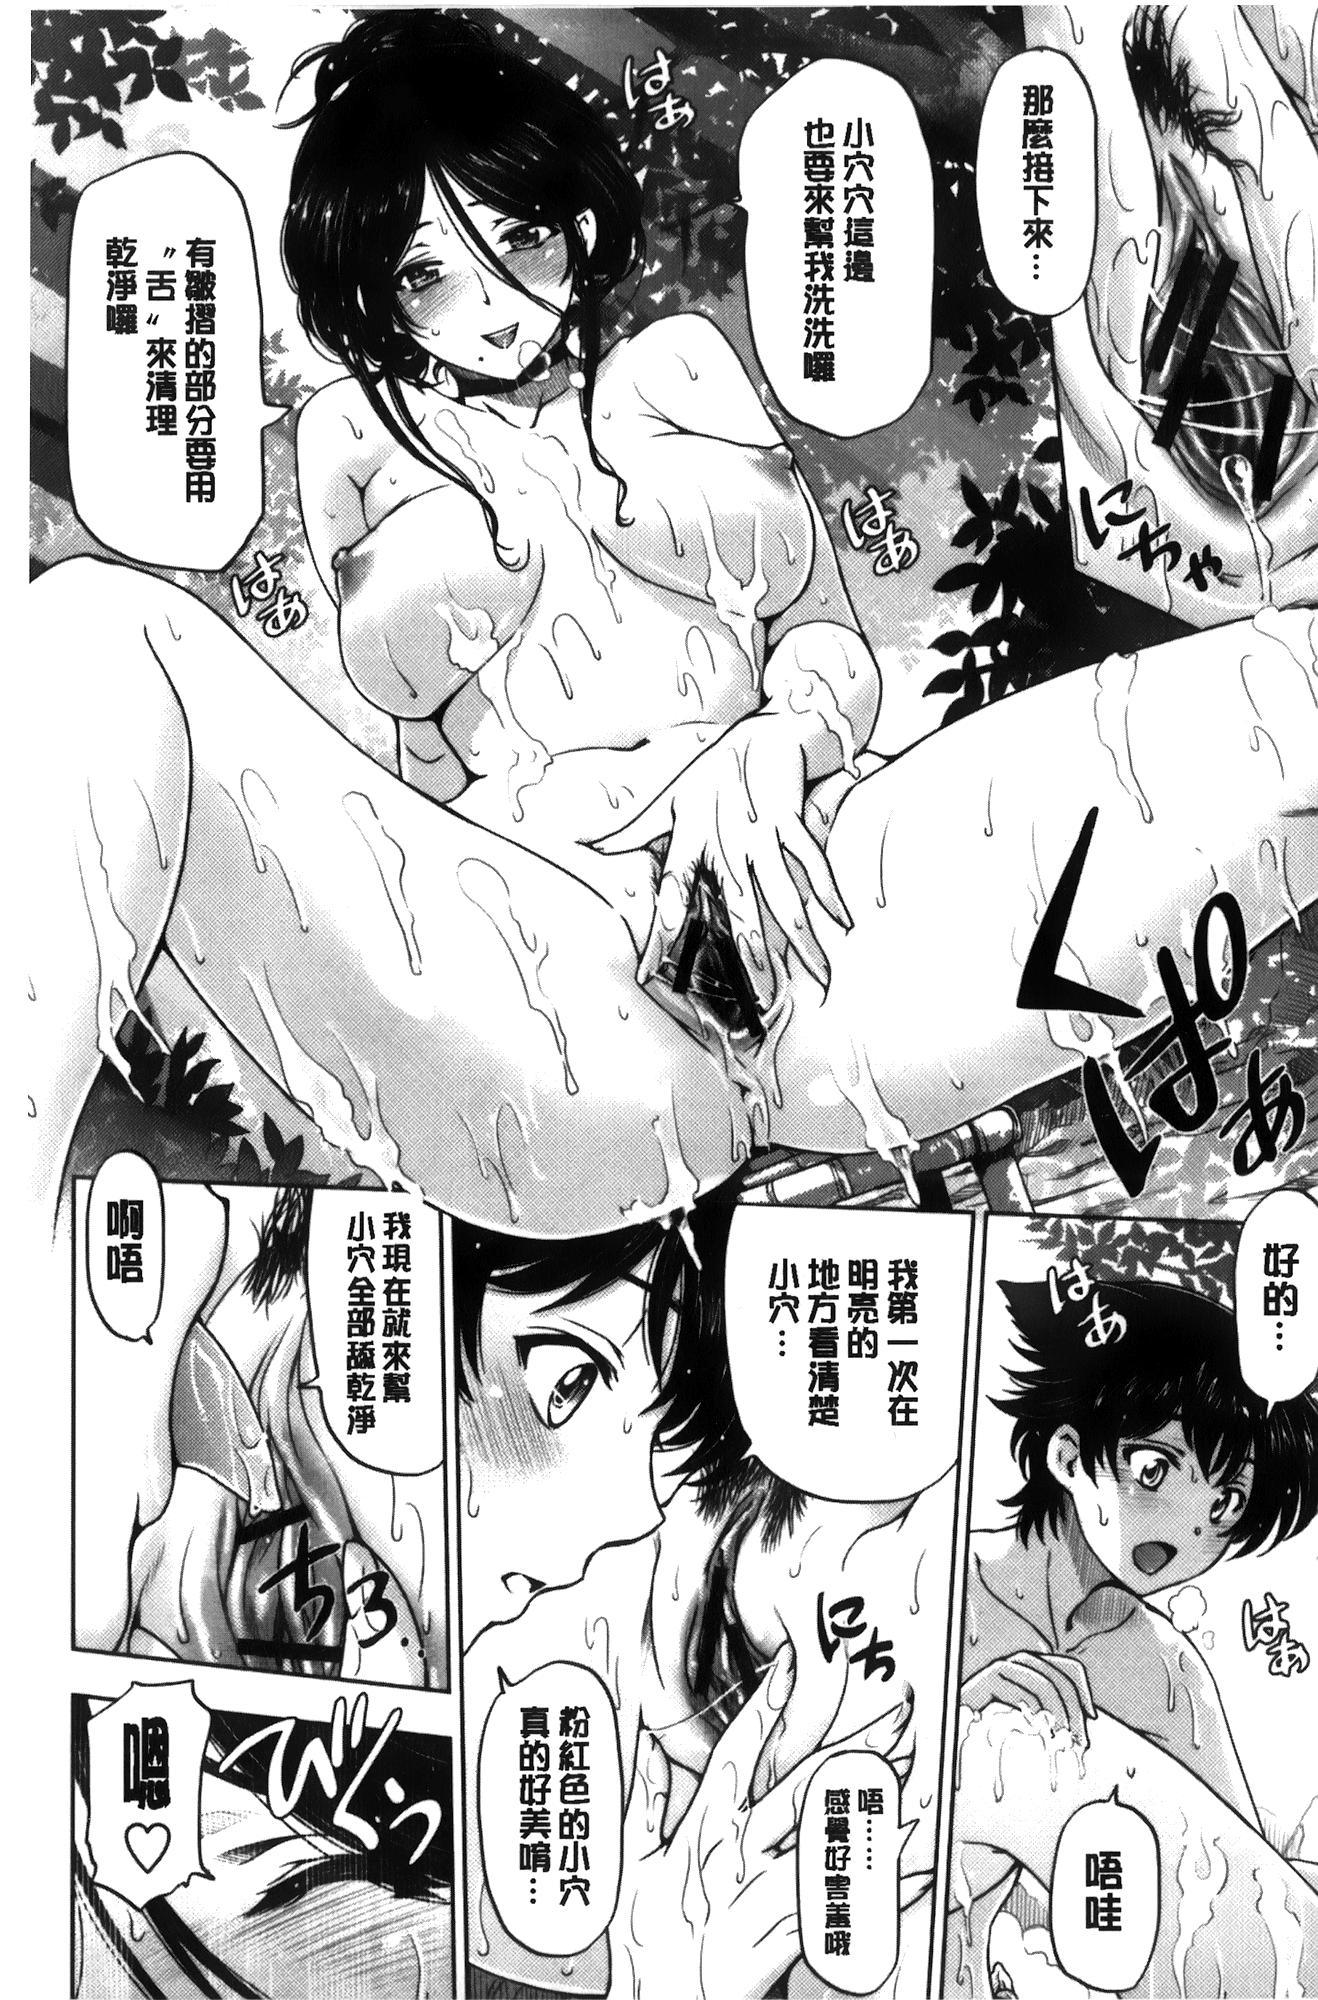 Majo × Shota ~ Genteiban | 魔女X小正太 限定版 140